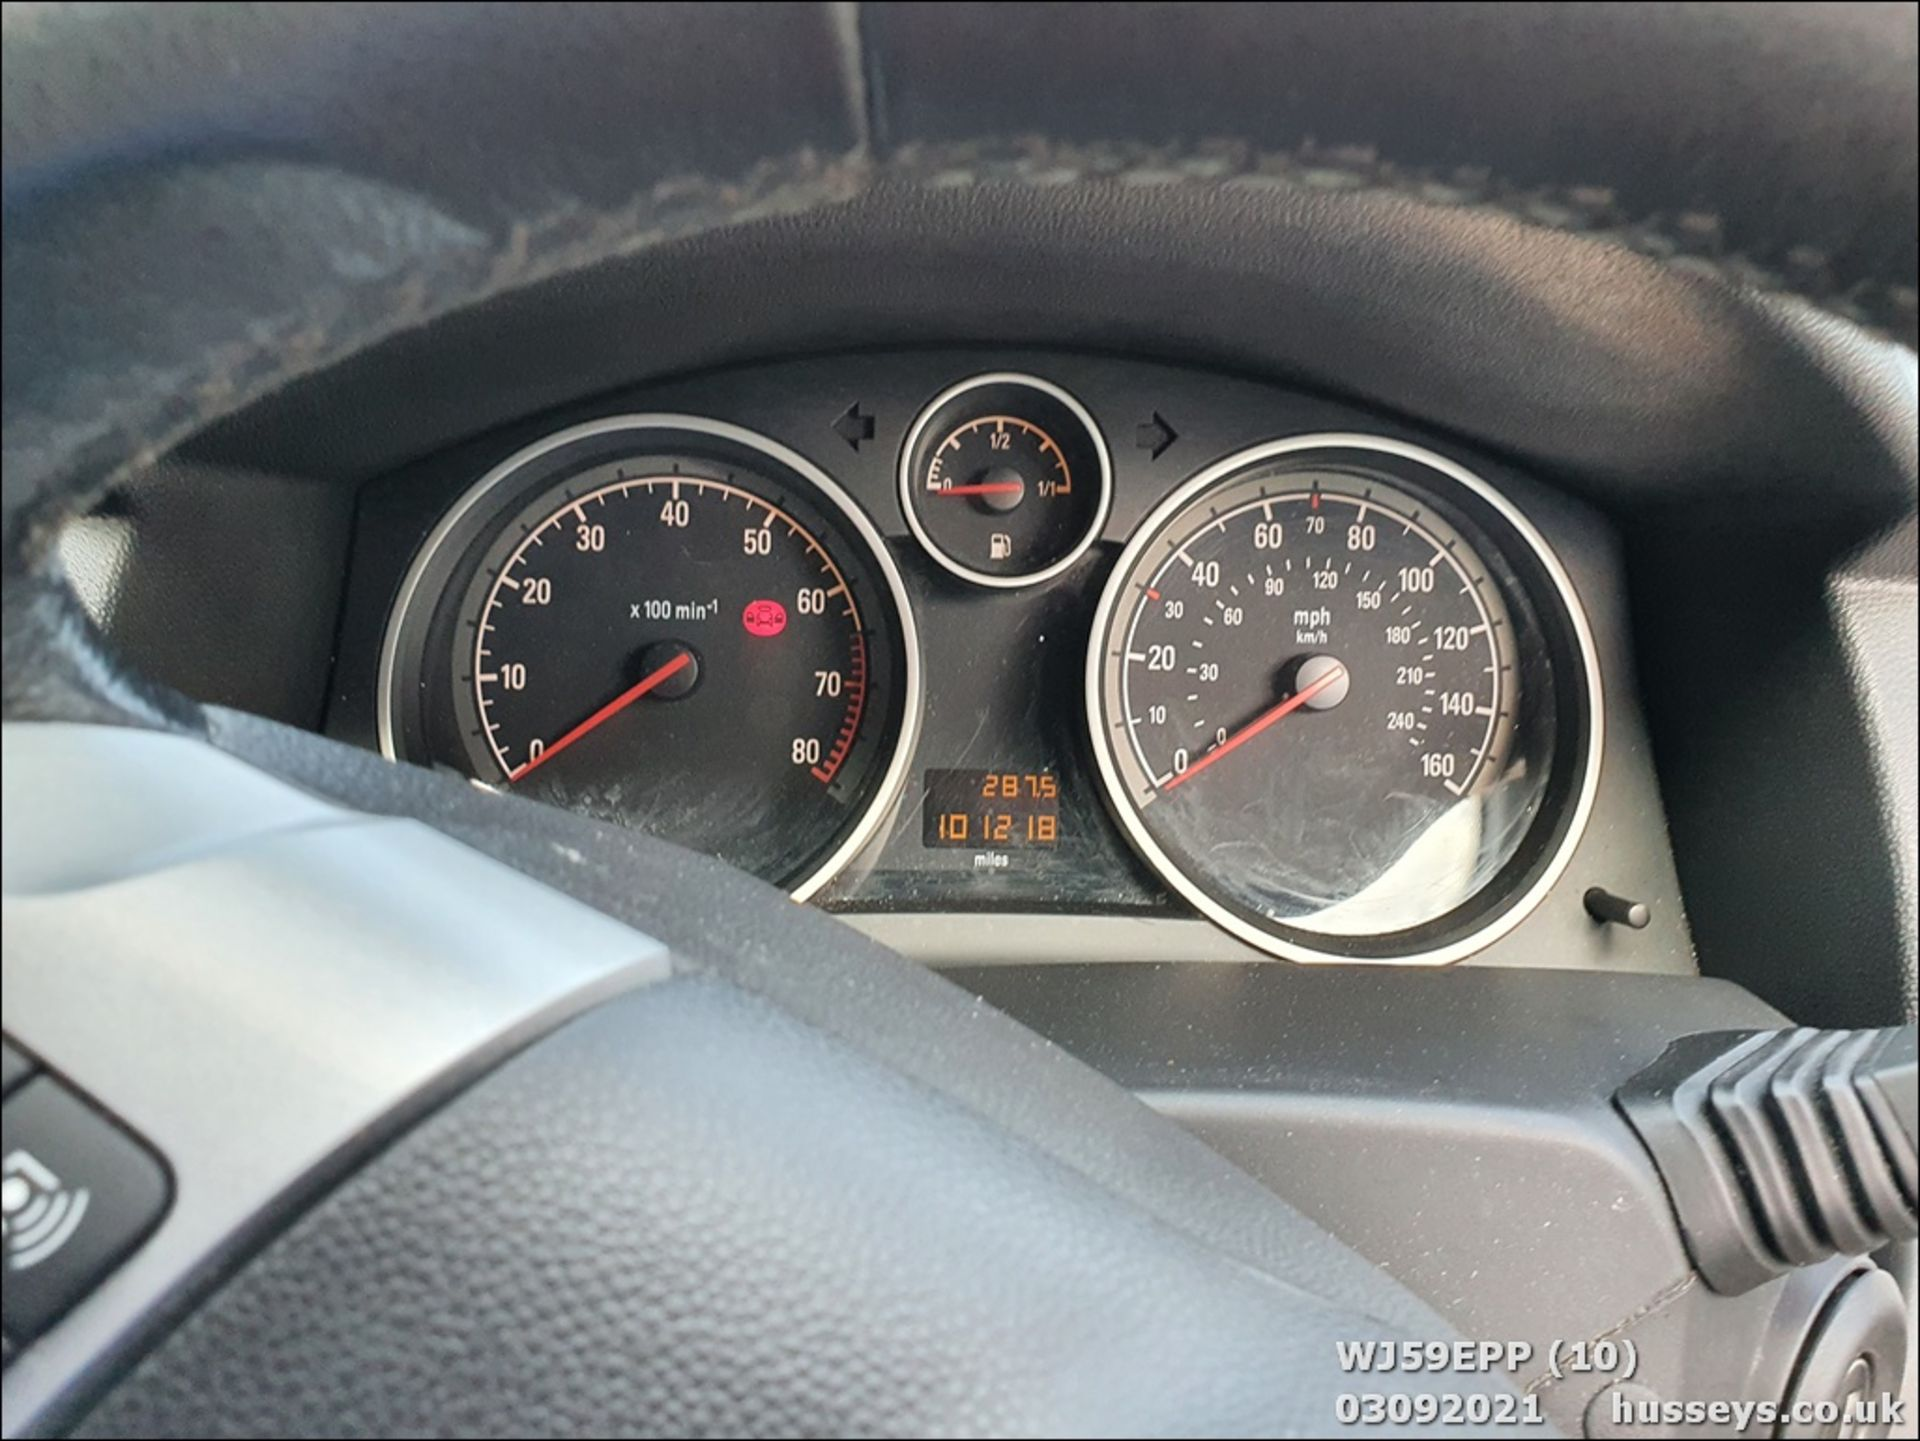 09/59 VAUXHALL ASTRA ACTIVE - 1364cc 5dr Hatchback (Silver, 101k) - Image 10 of 12